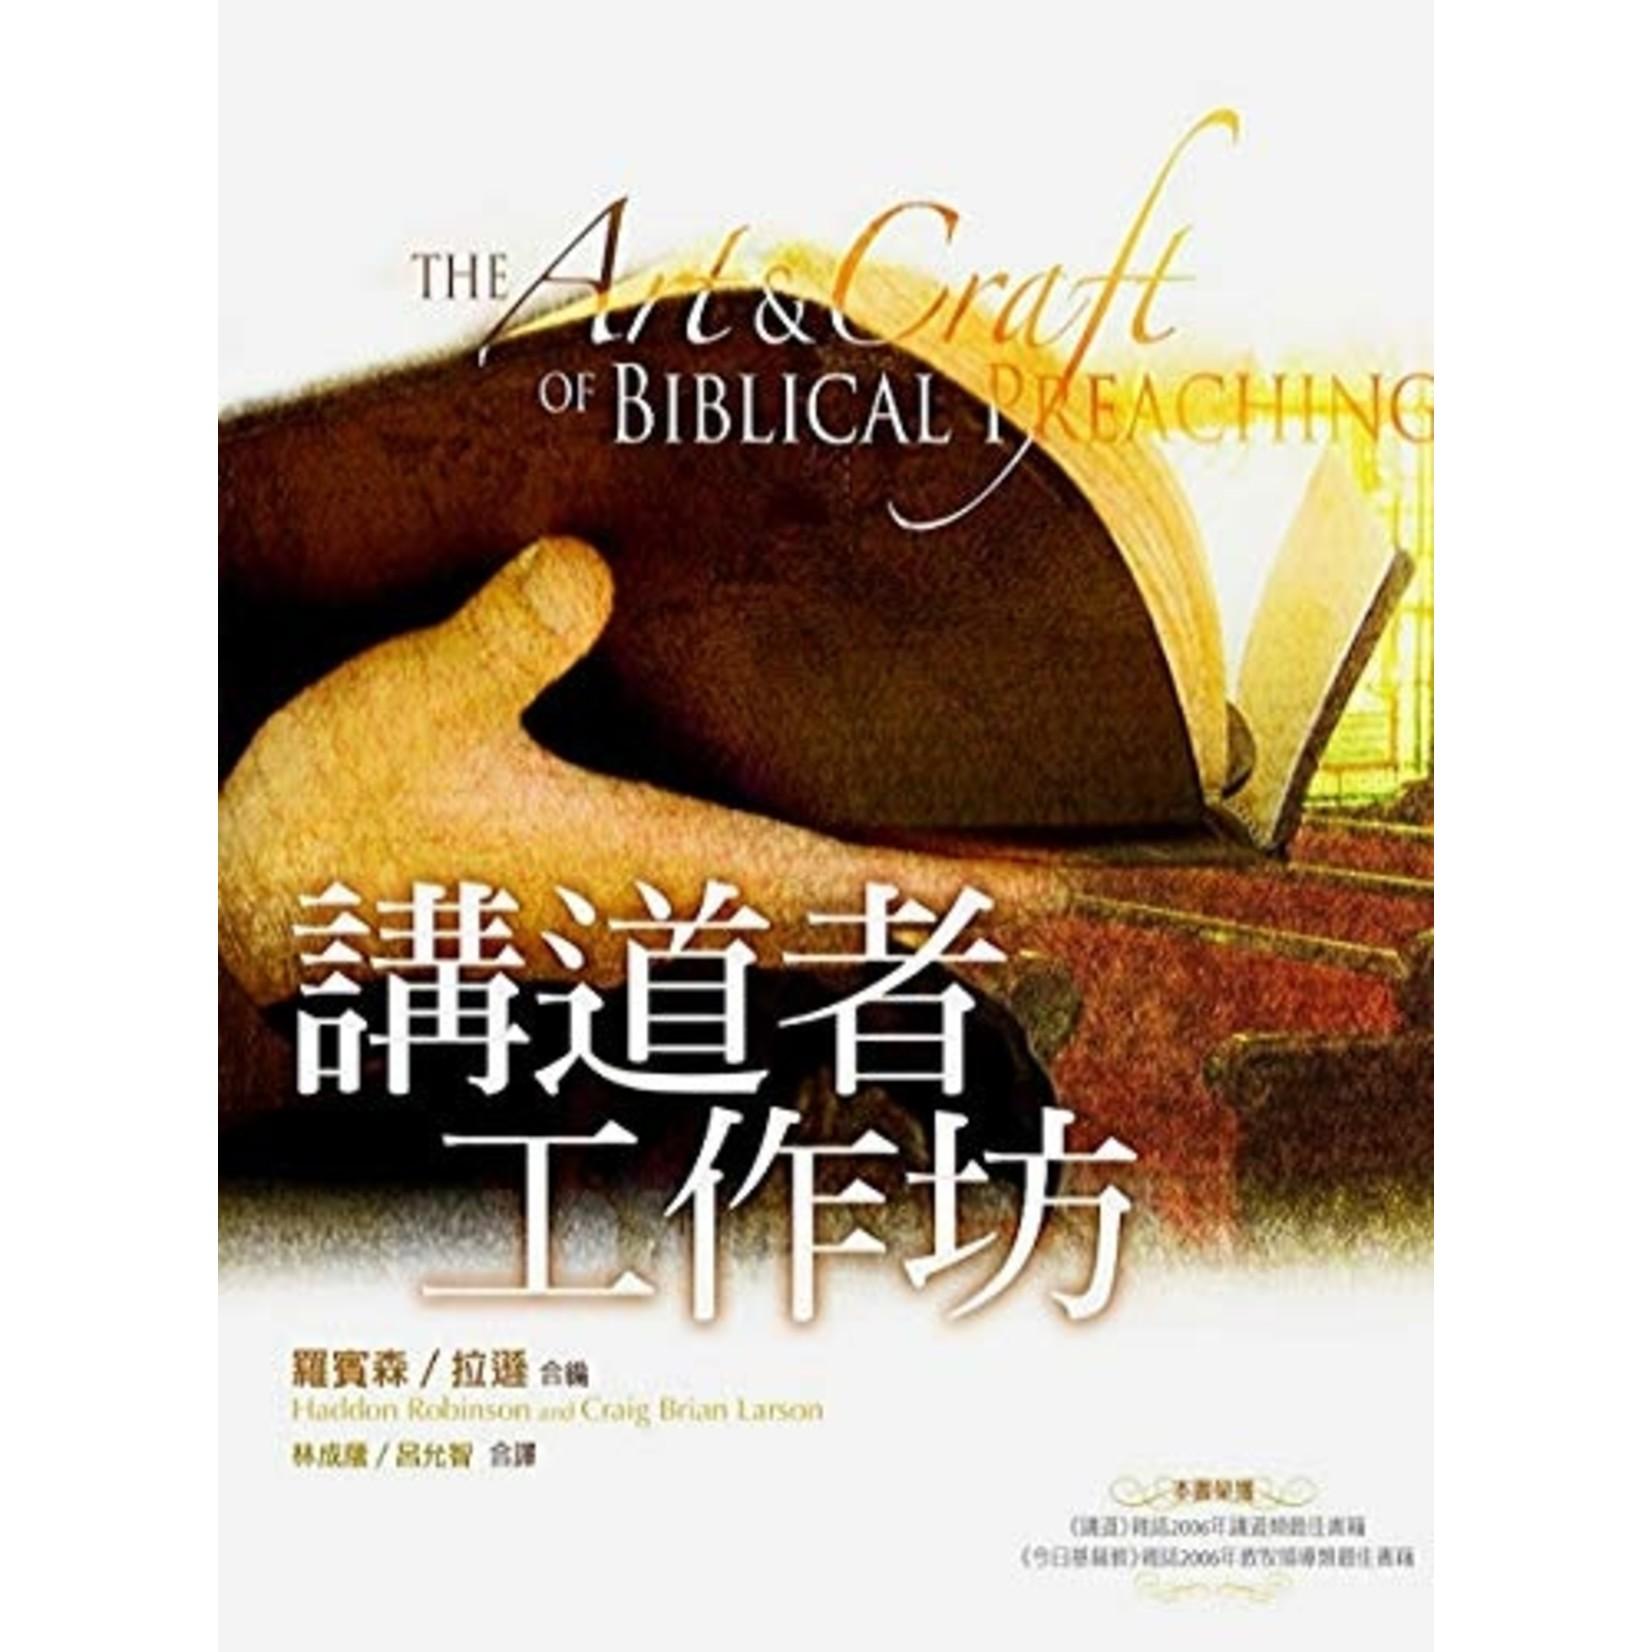 更新傳道會 Christian Renewal Ministries 講道者工作坊 The Art and Craft of Biblical Preaching